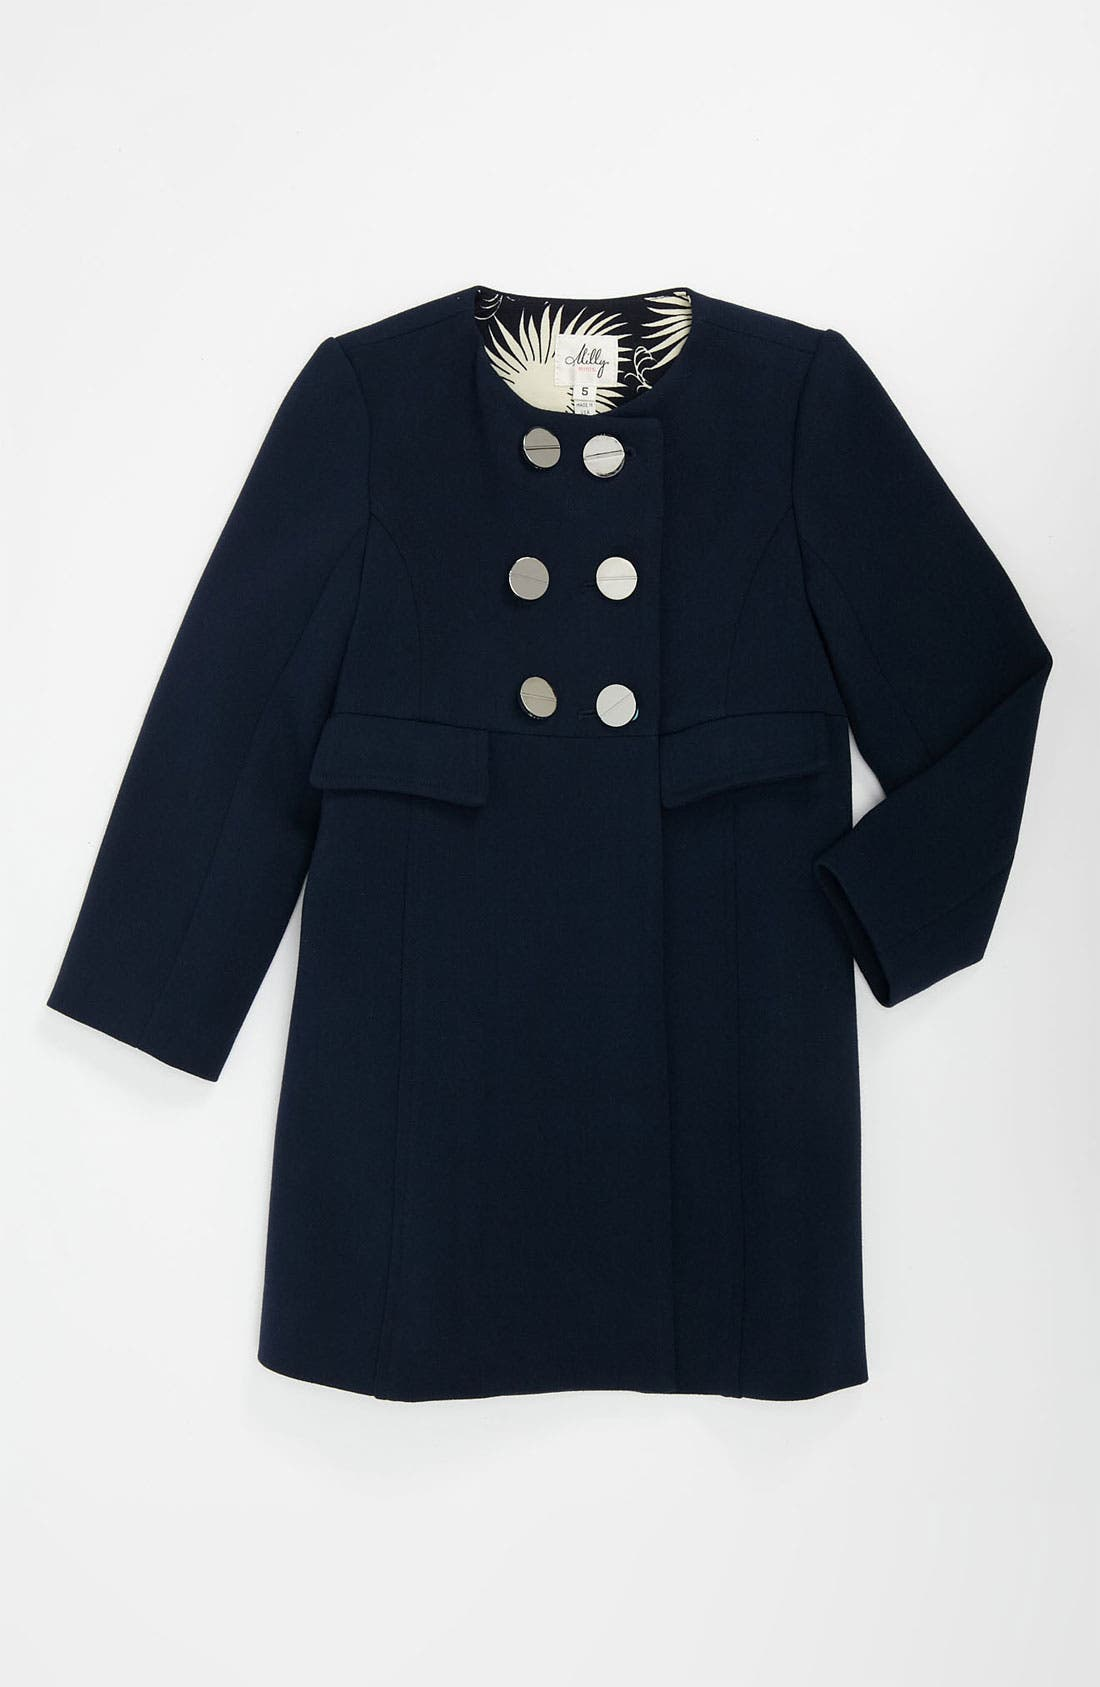 Alternate Image 1 Selected - Milly Minis Sleeveless Dress & Double Breasted Coat (Little Girls & Big Girls)